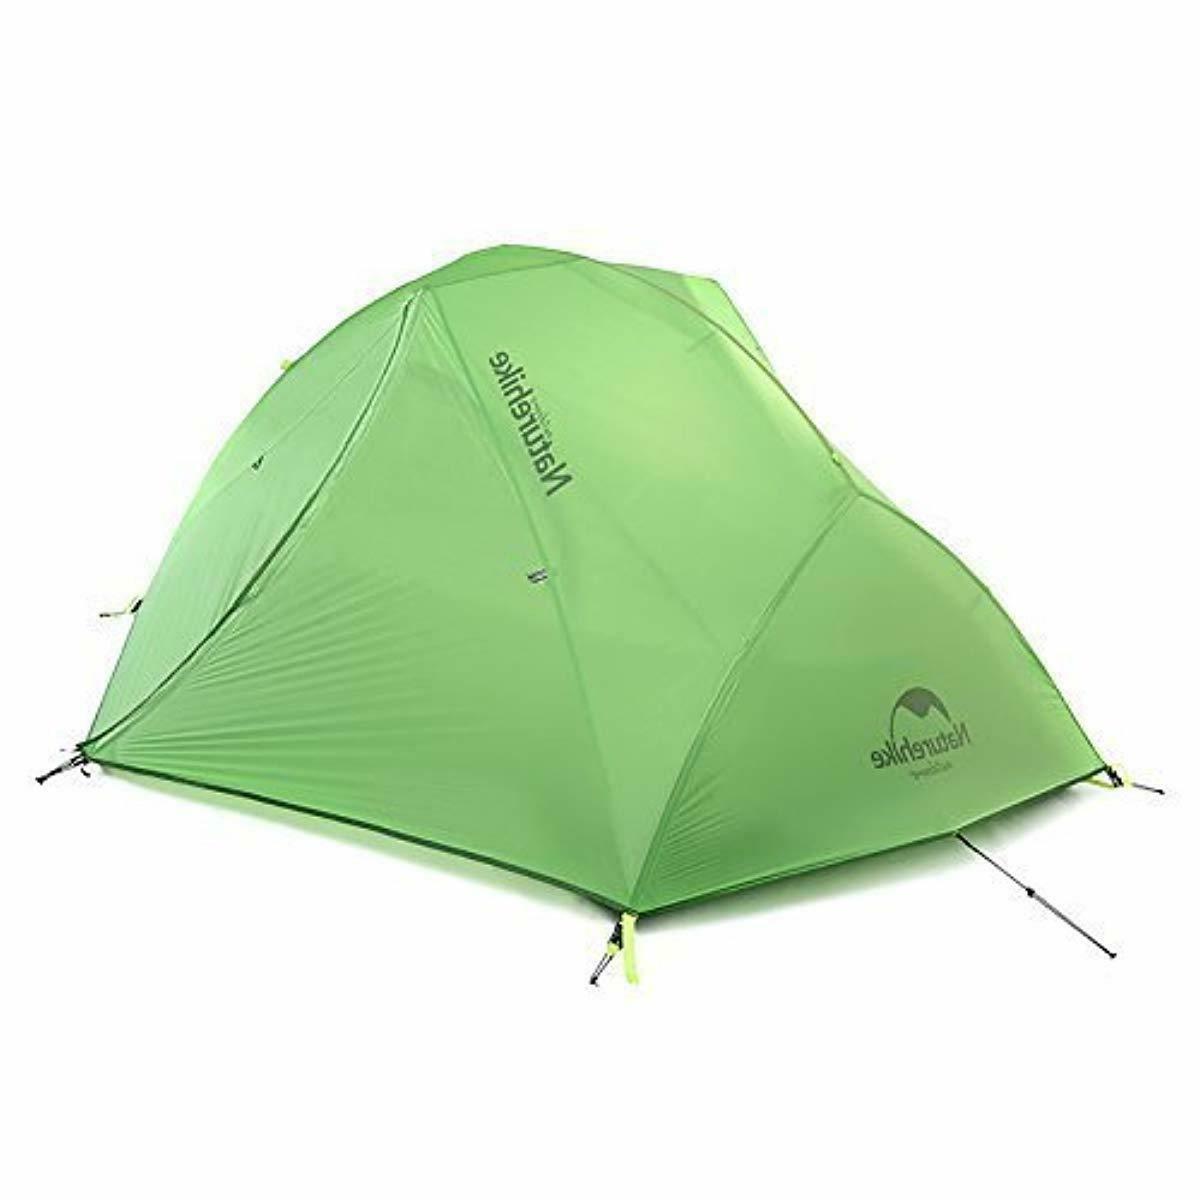 Naturehike 2 Person Camping Tent Outdoor Waterproof Tent